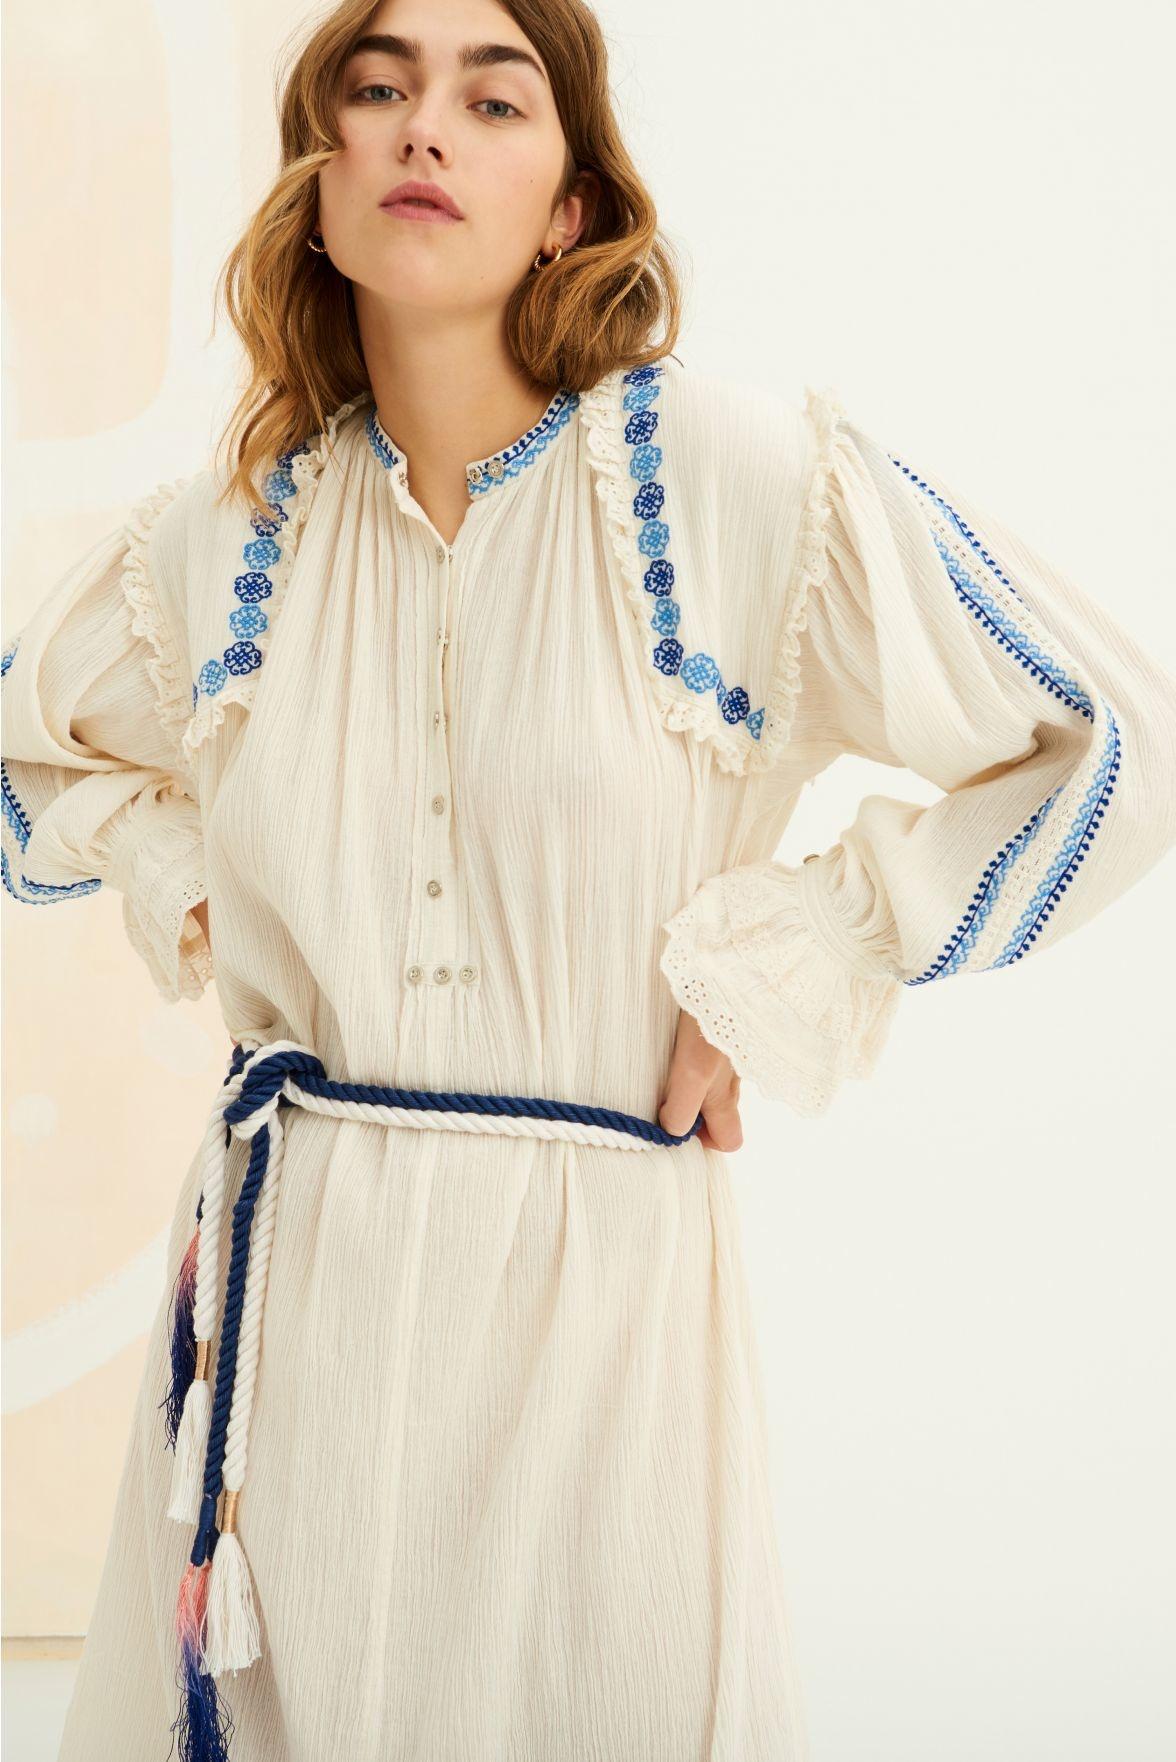 Pietro embroidered Dress white-1